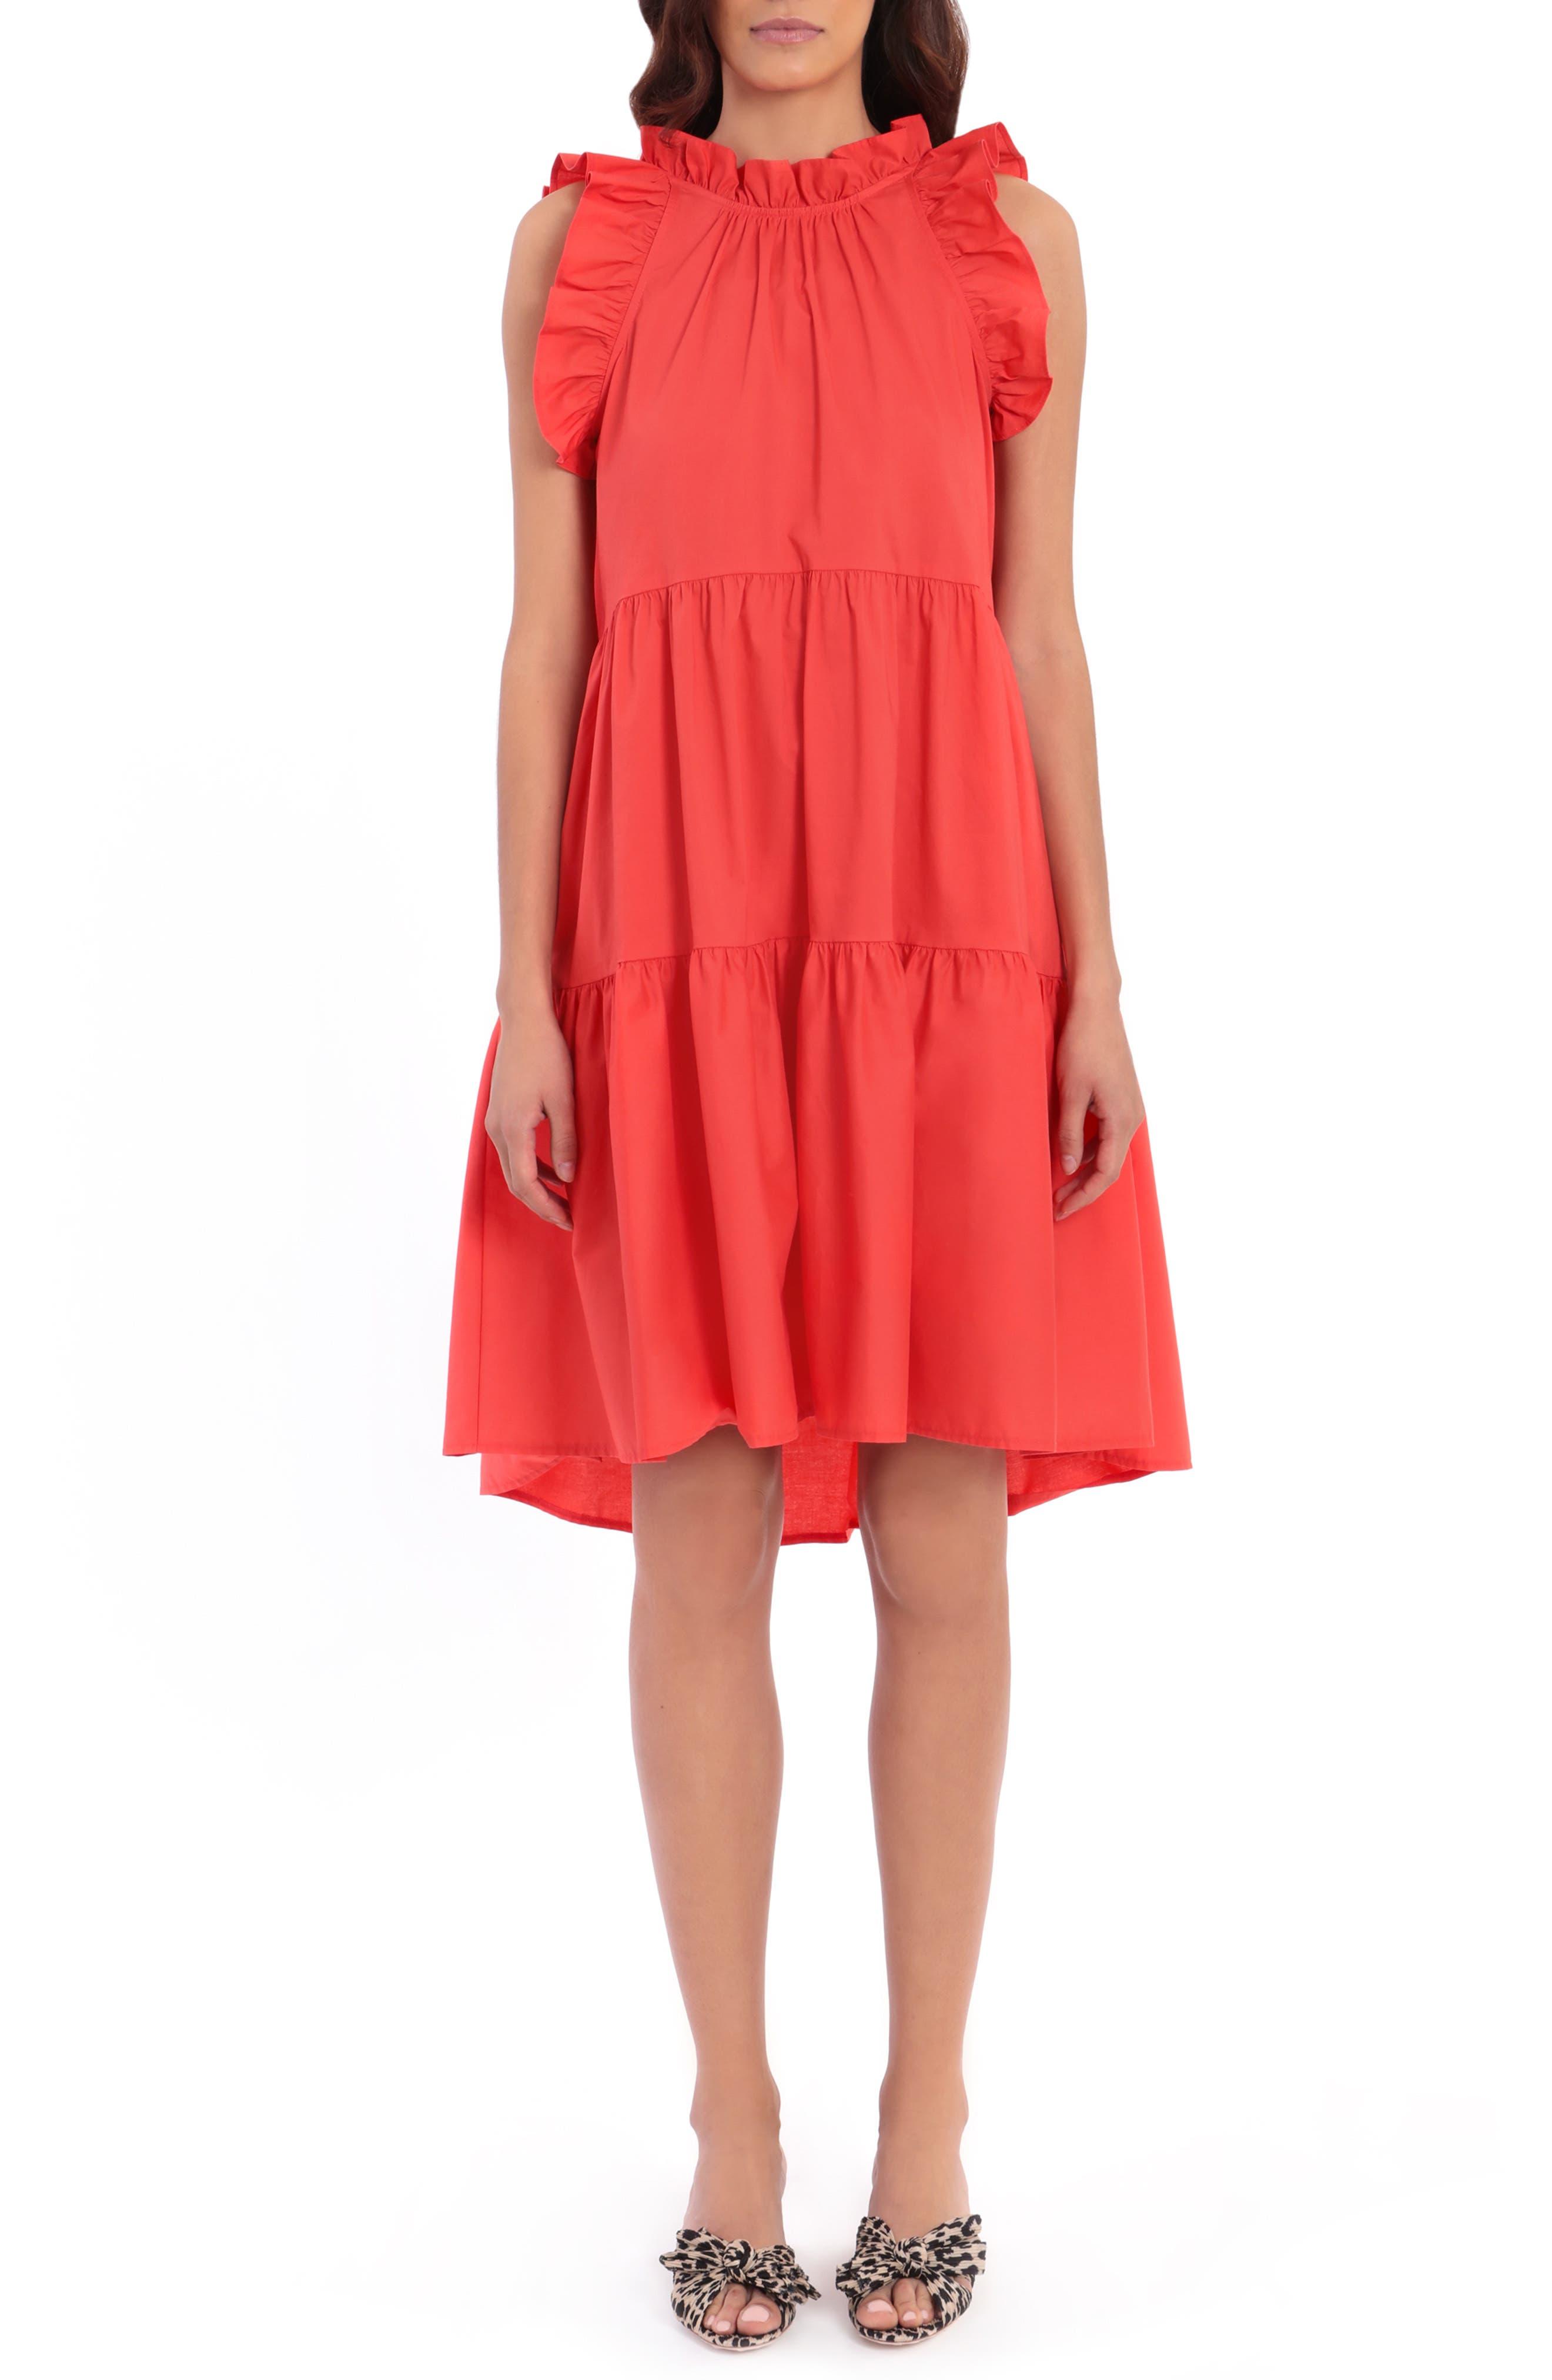 Tiered Ruffle Sleeveless Stretch Cotton Poplin Shift Dress